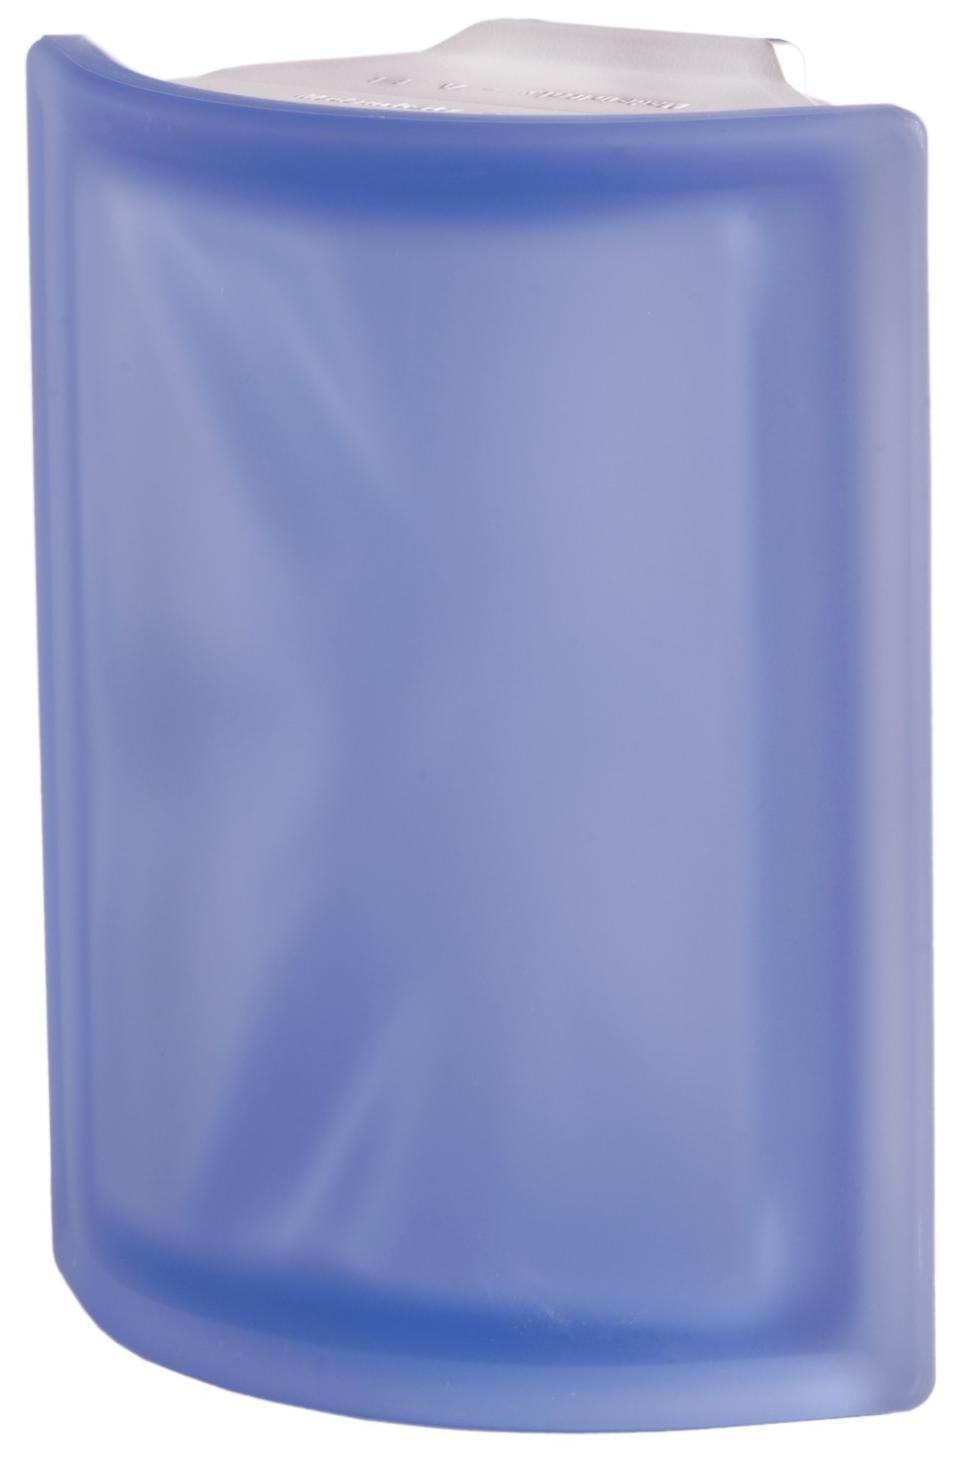 Luxfera Pegasus Angolare O Blu, svlnkou, rohová 0